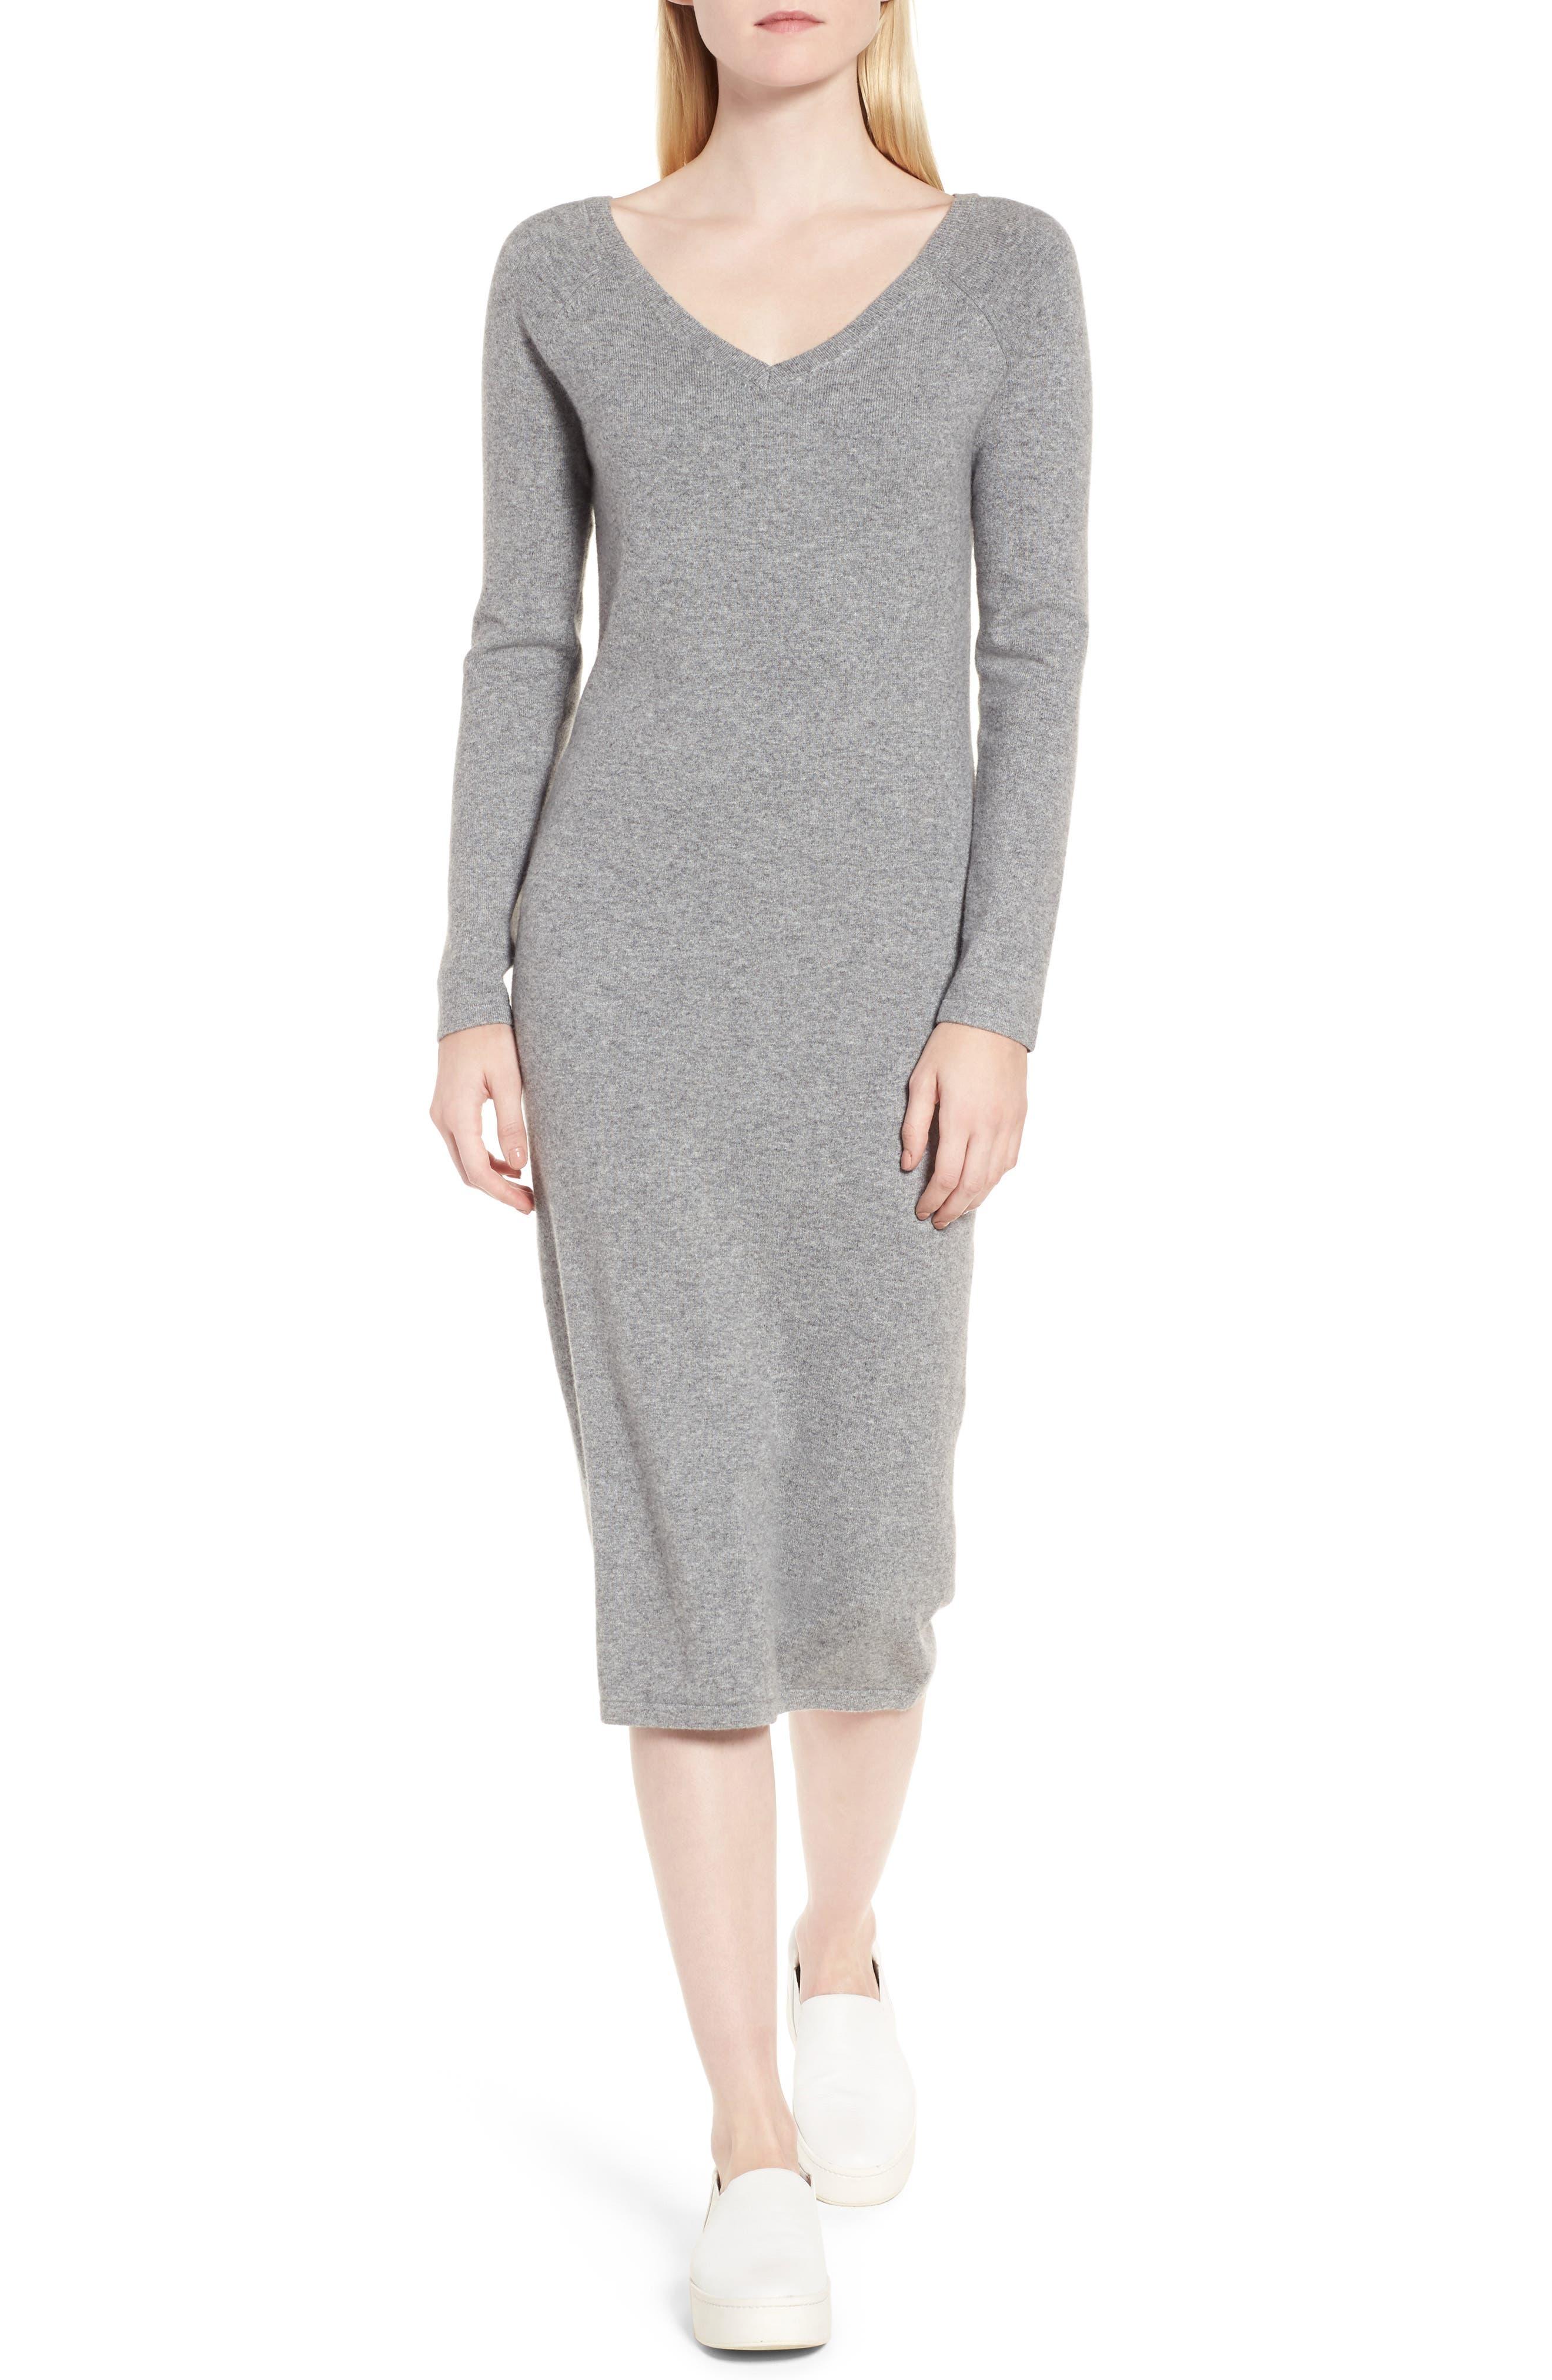 Cashmere Blend V-Neck Midi Dress,                         Main,                         color, Grey Filigree Heather